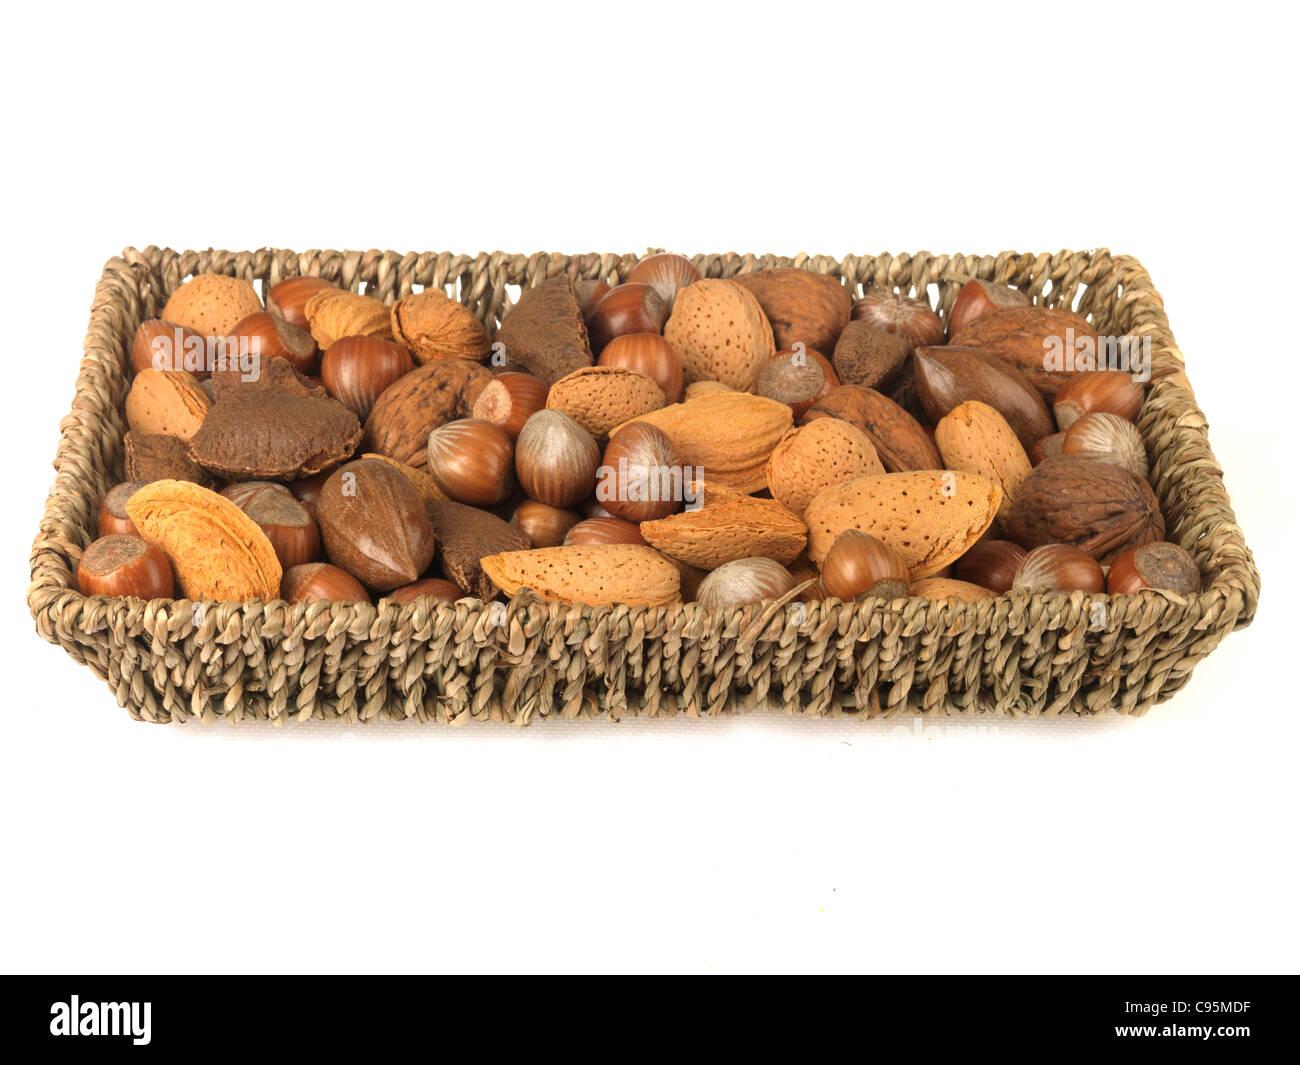 Tray of Mixed Nuts - Stock Image